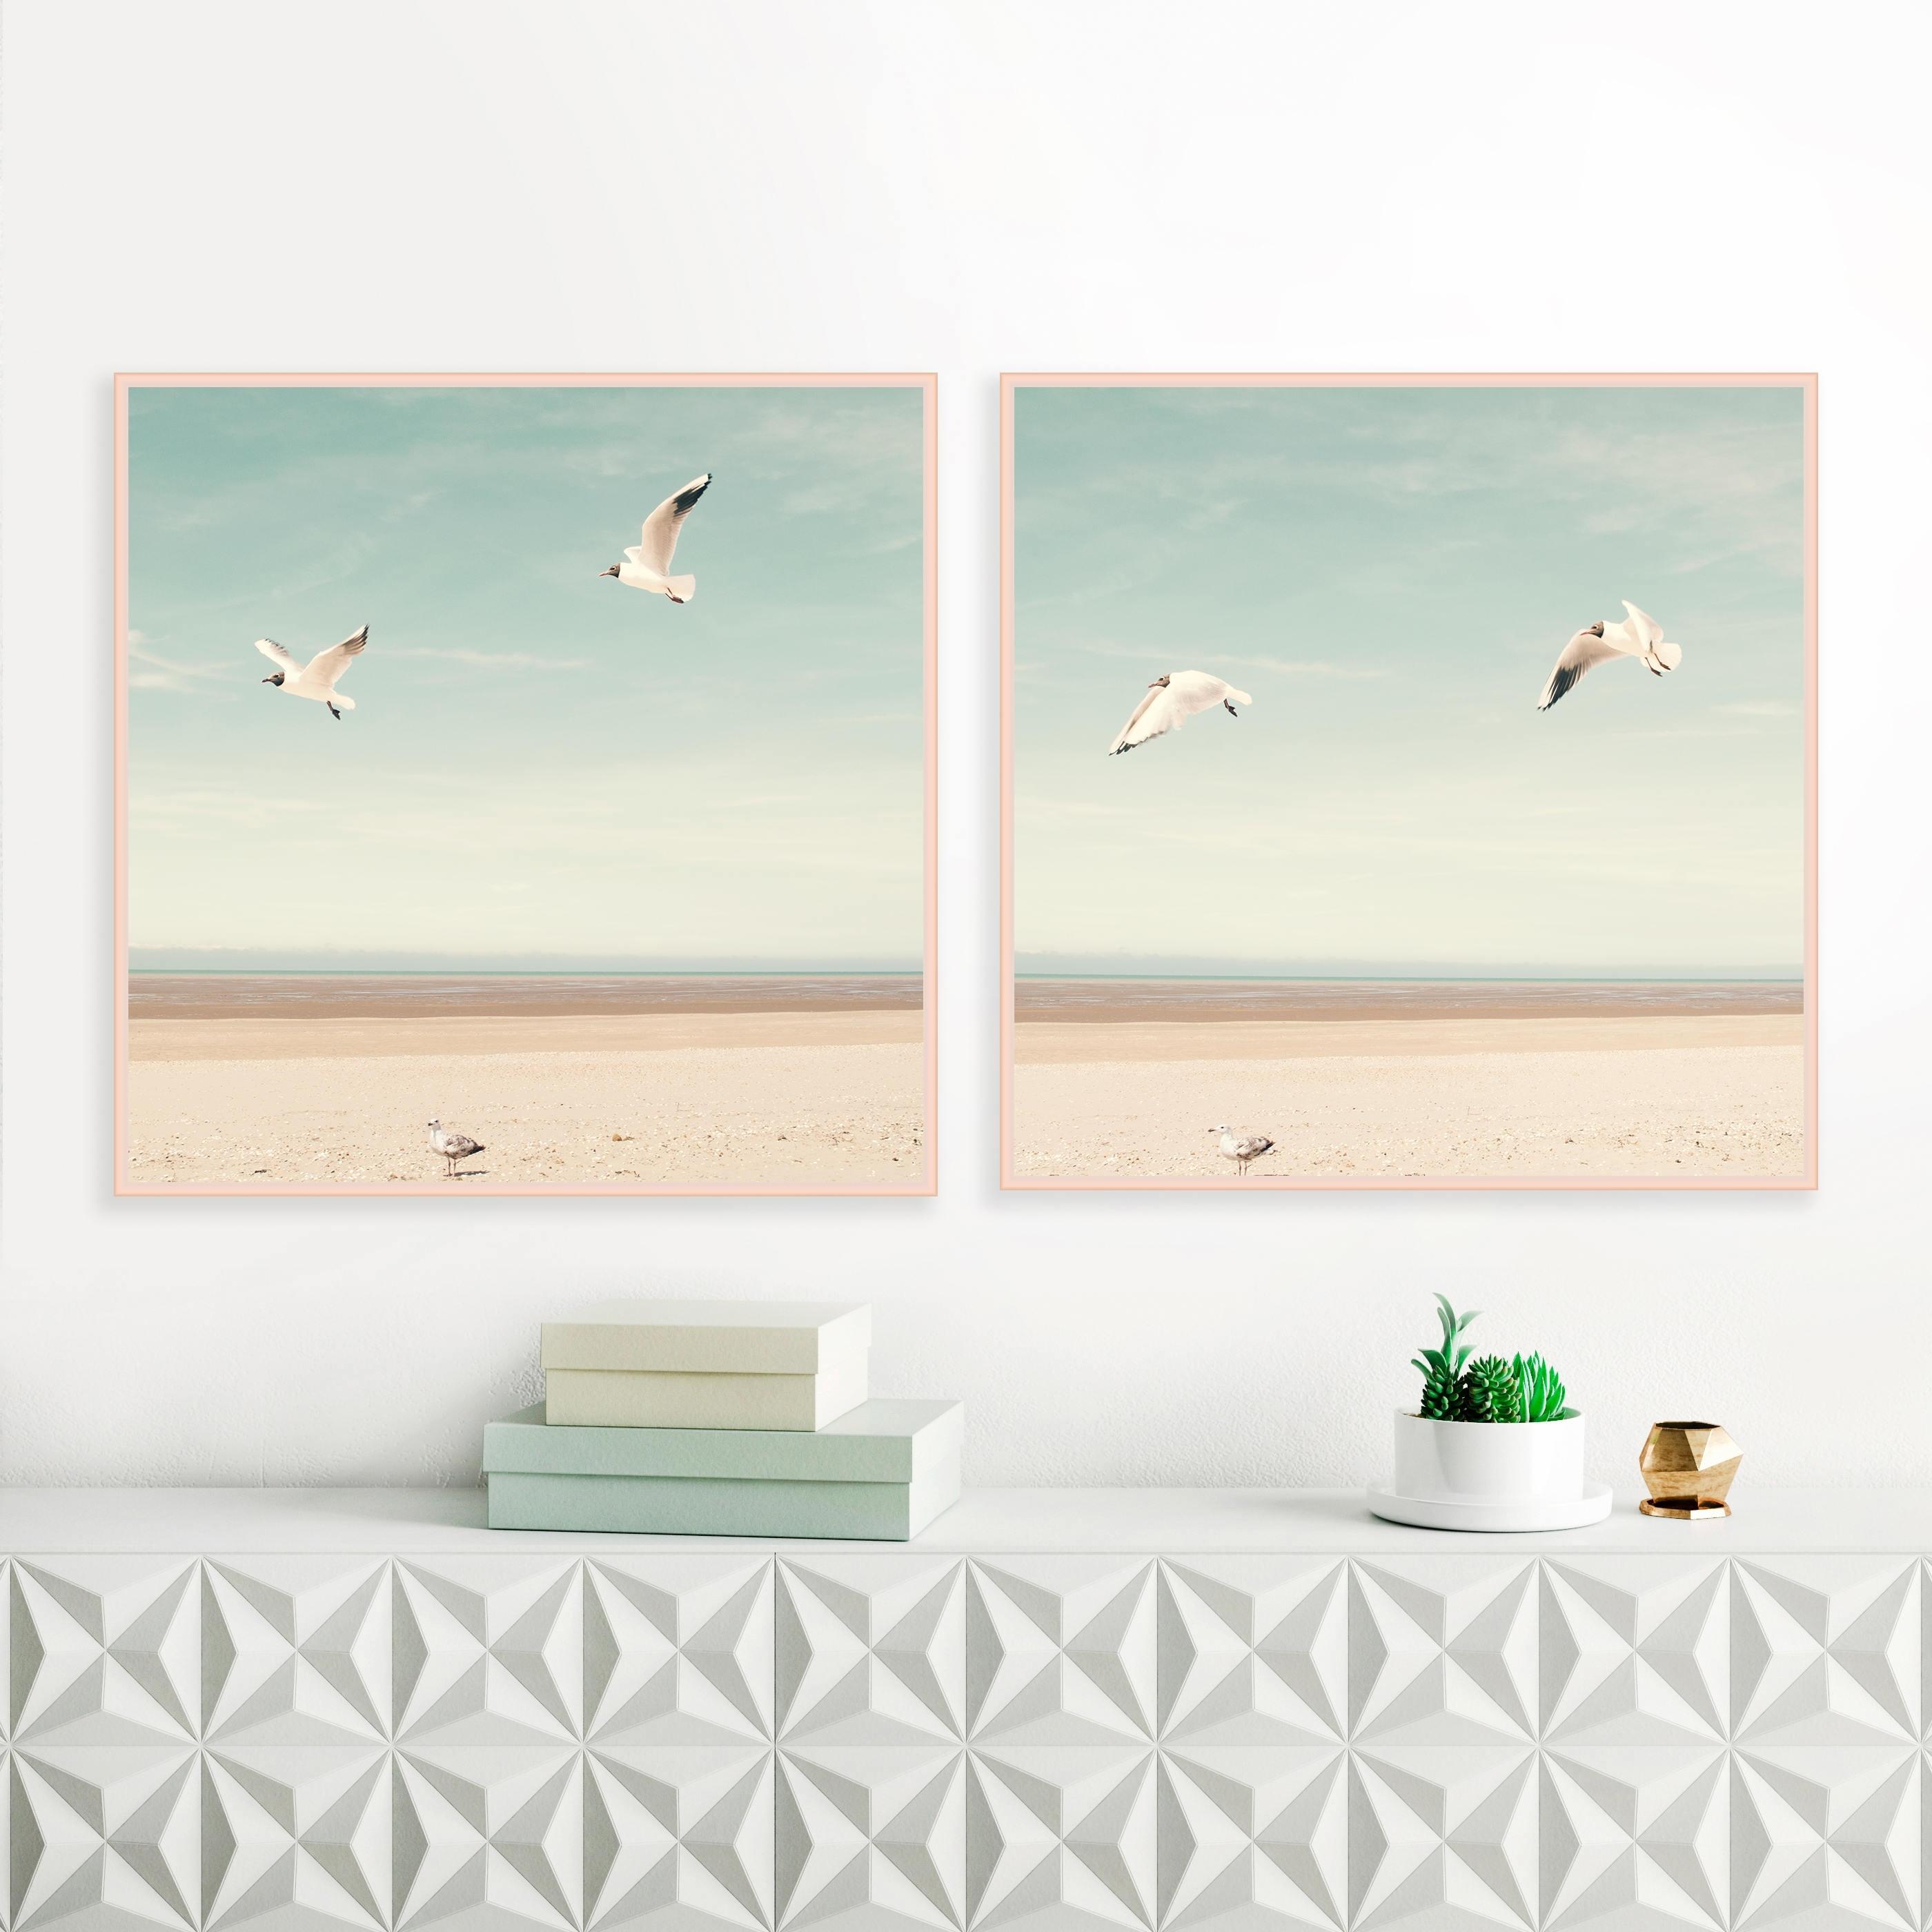 Coastal Wall Art Within Famous Bird Prints, Beach Photography, Beach Wall Art, Sea Gulls (View 6 of 15)